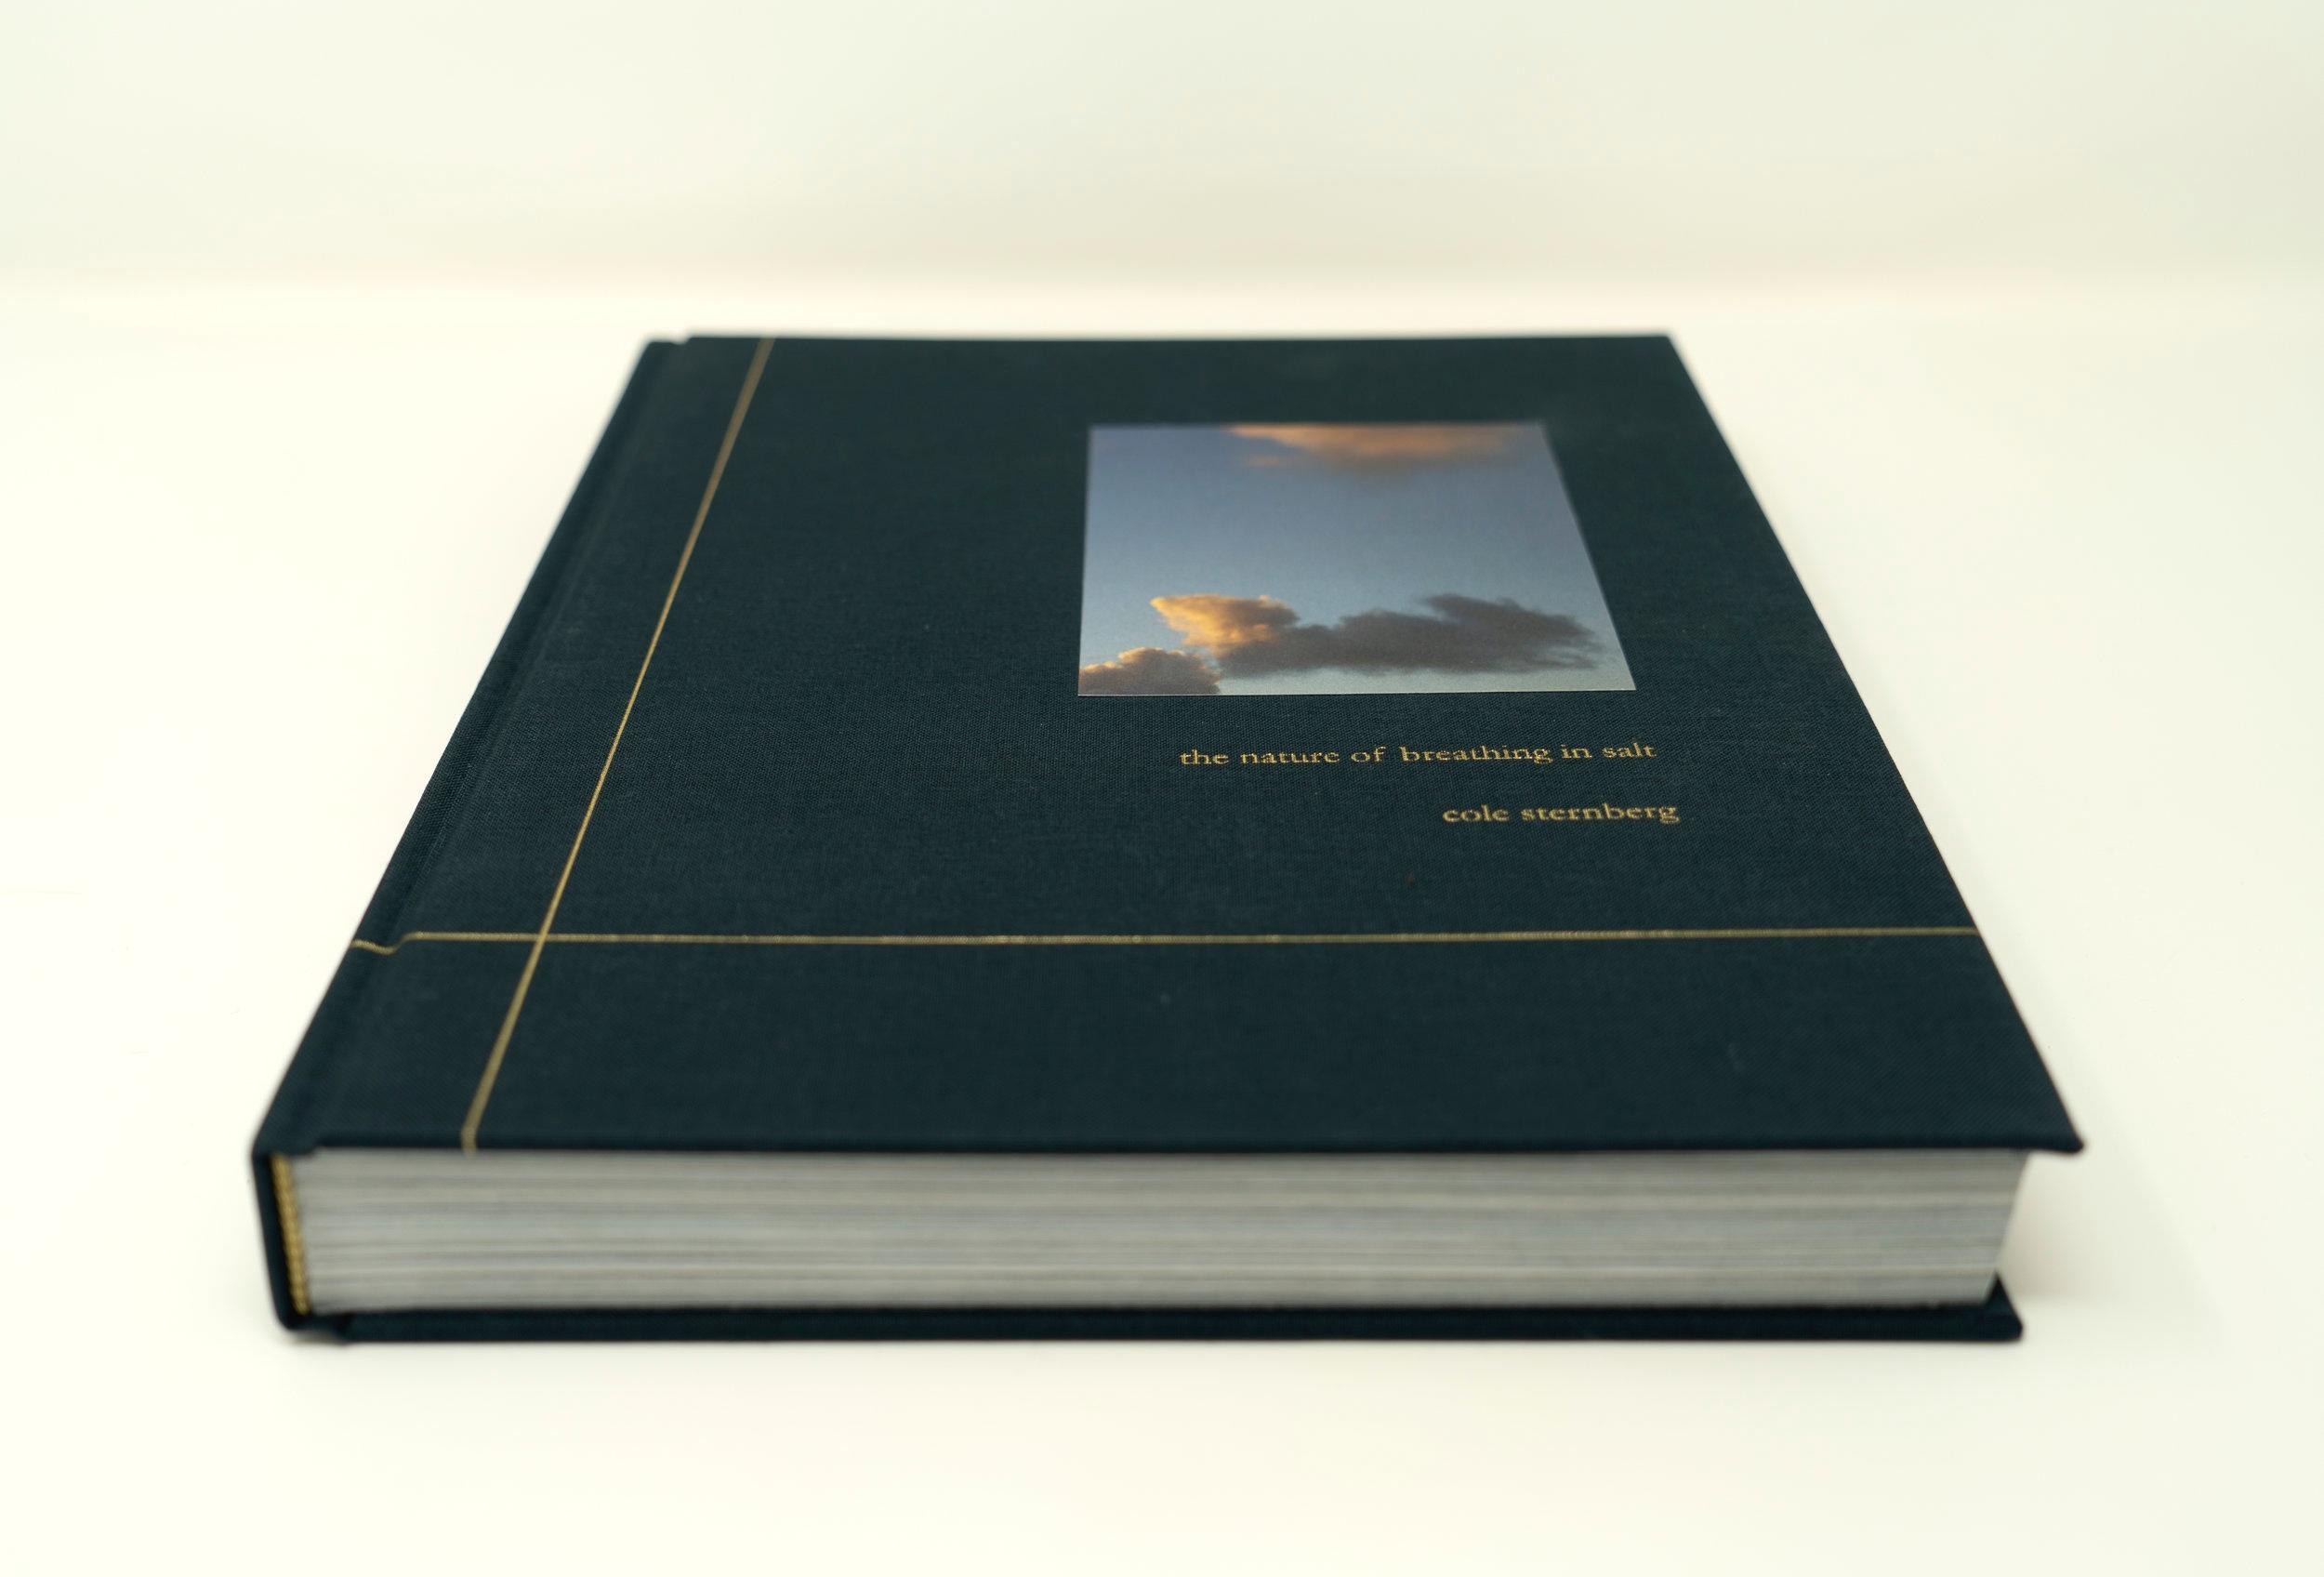 The+Nature+of+Breathing+in+Salt+-+Cole+Sternberg+-+Cover.jpg